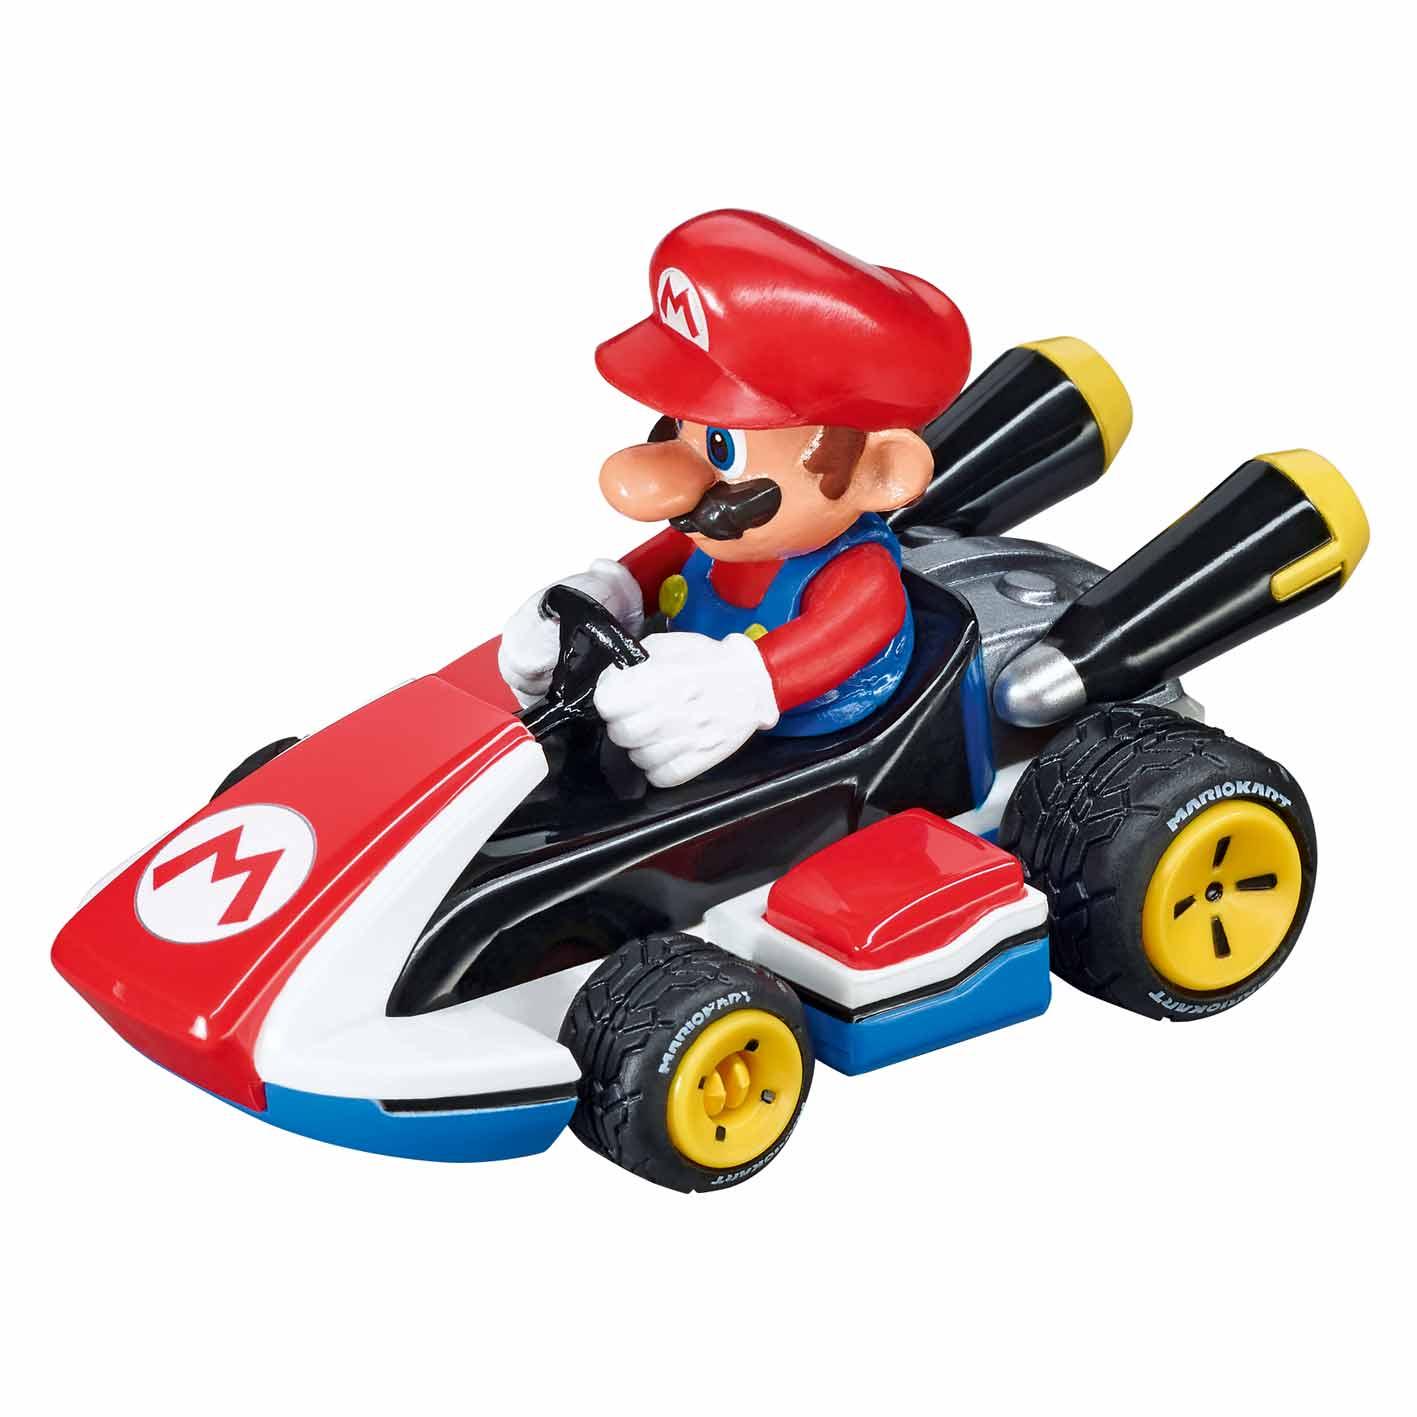 Carrera - GO!!! Car - Nintendo Mario Kart™ 8 - Mario (20064033)